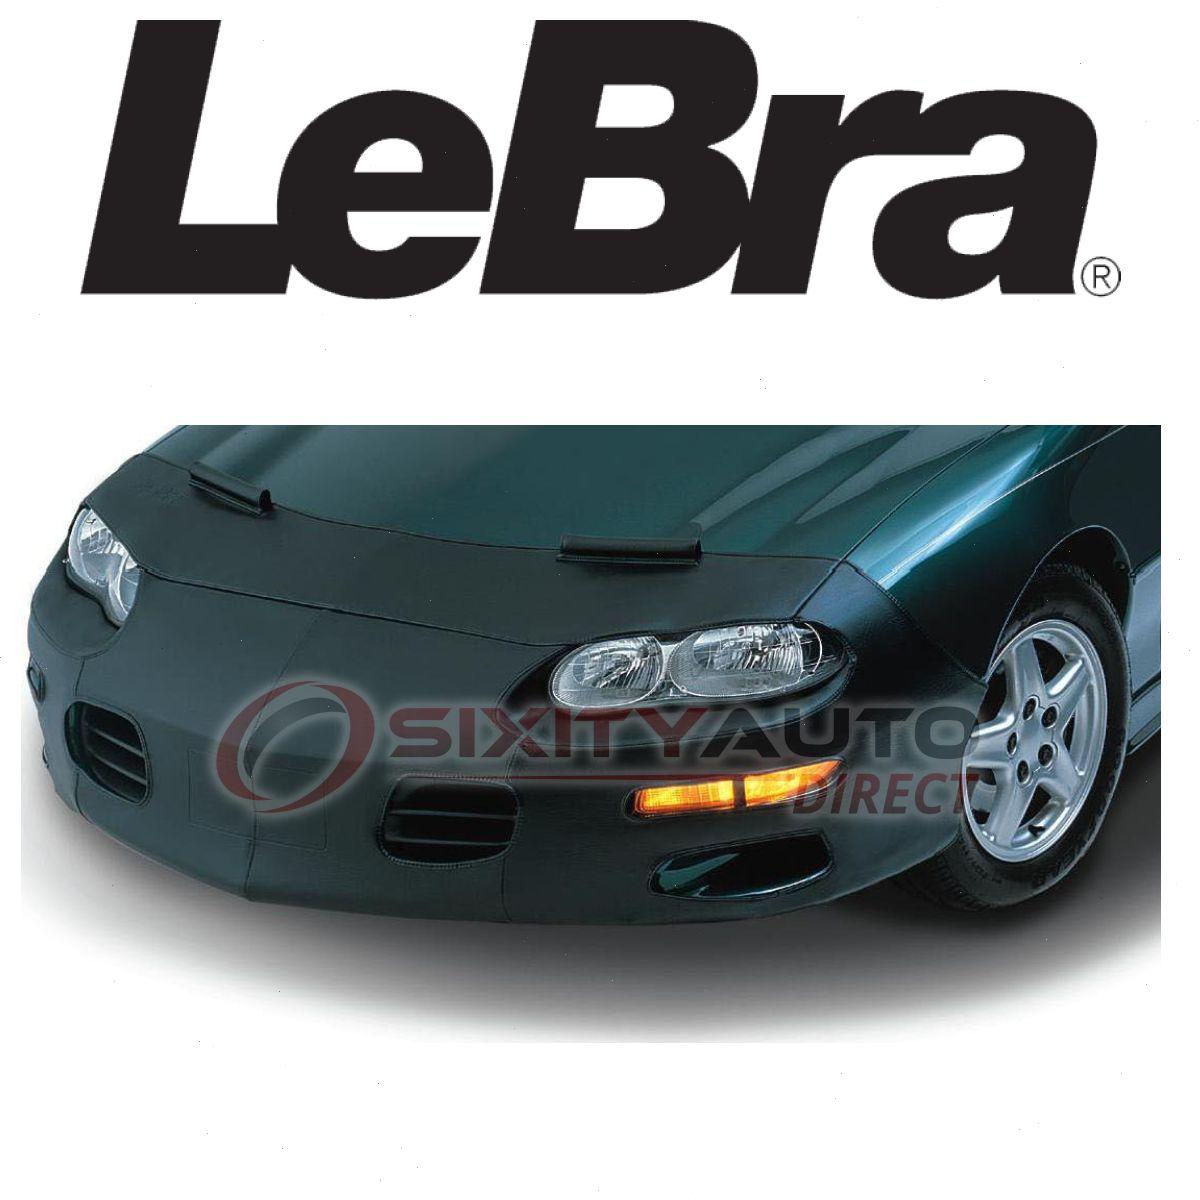 Lebra Front End Bra For 2011 2014 Dodge Challenger Accessories Fluids Tv Ebay